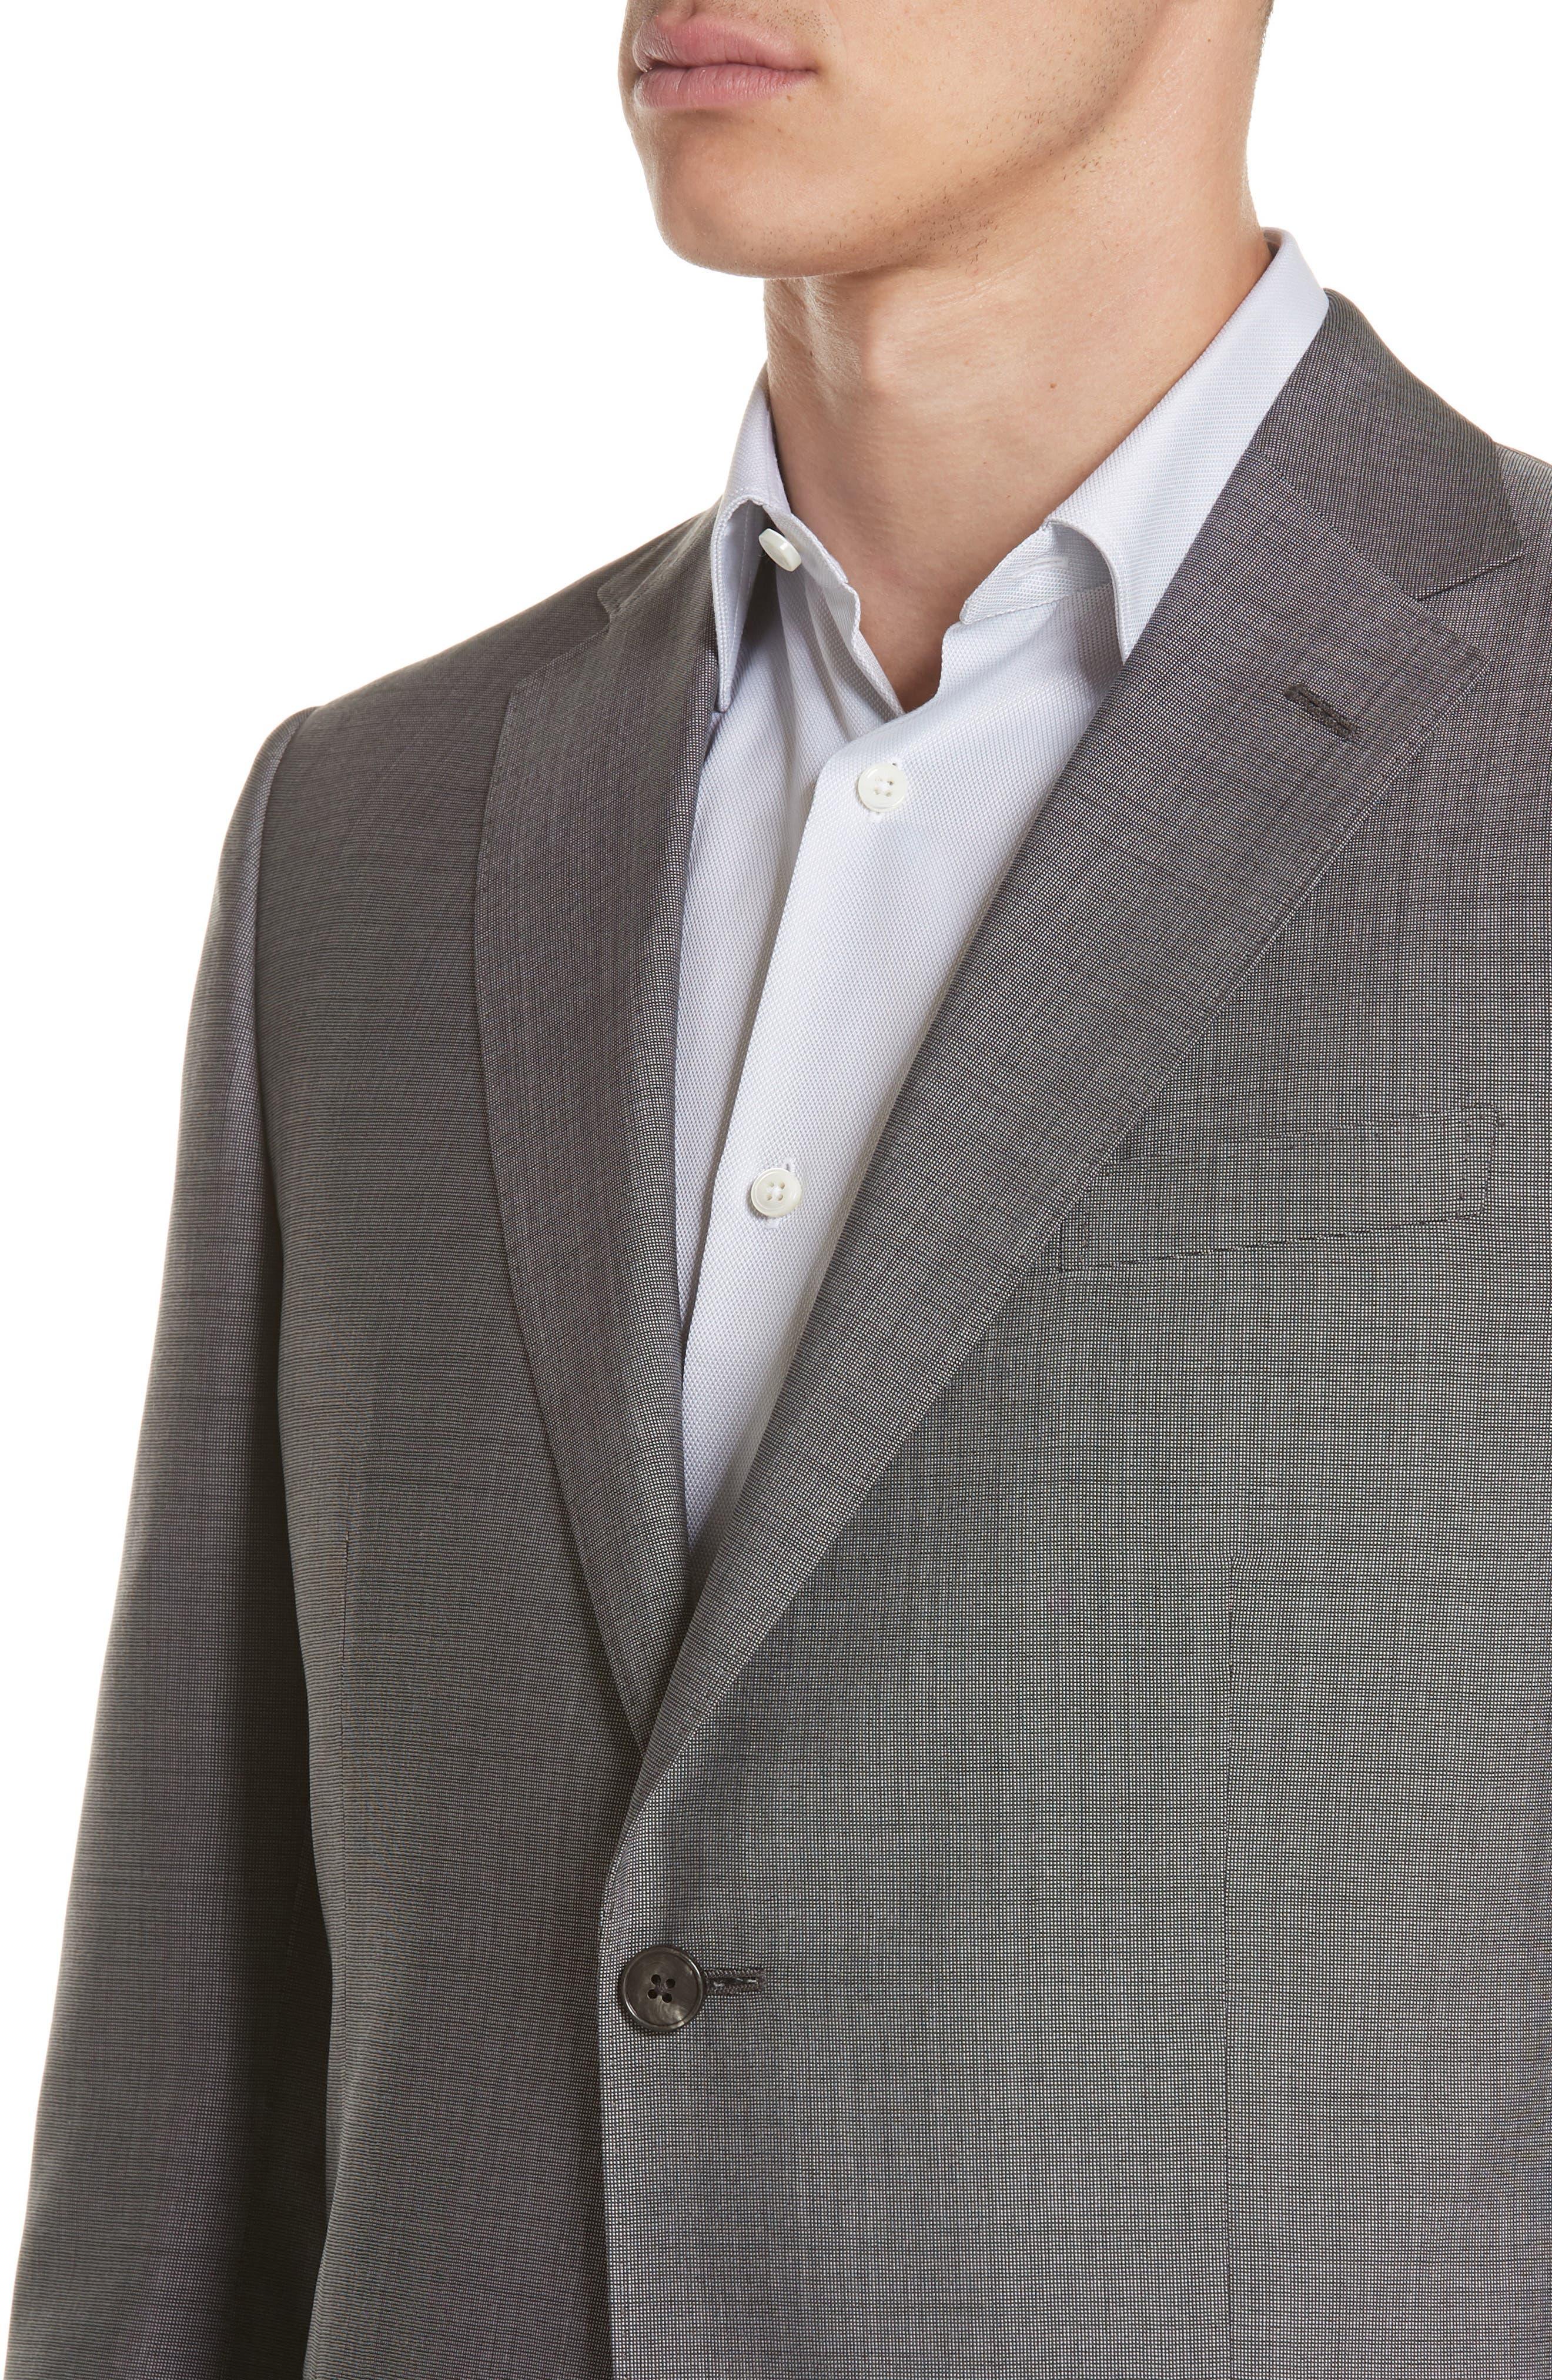 Trim Fit Solid Wool & Silk Suit,                             Alternate thumbnail 4, color,                             Grey